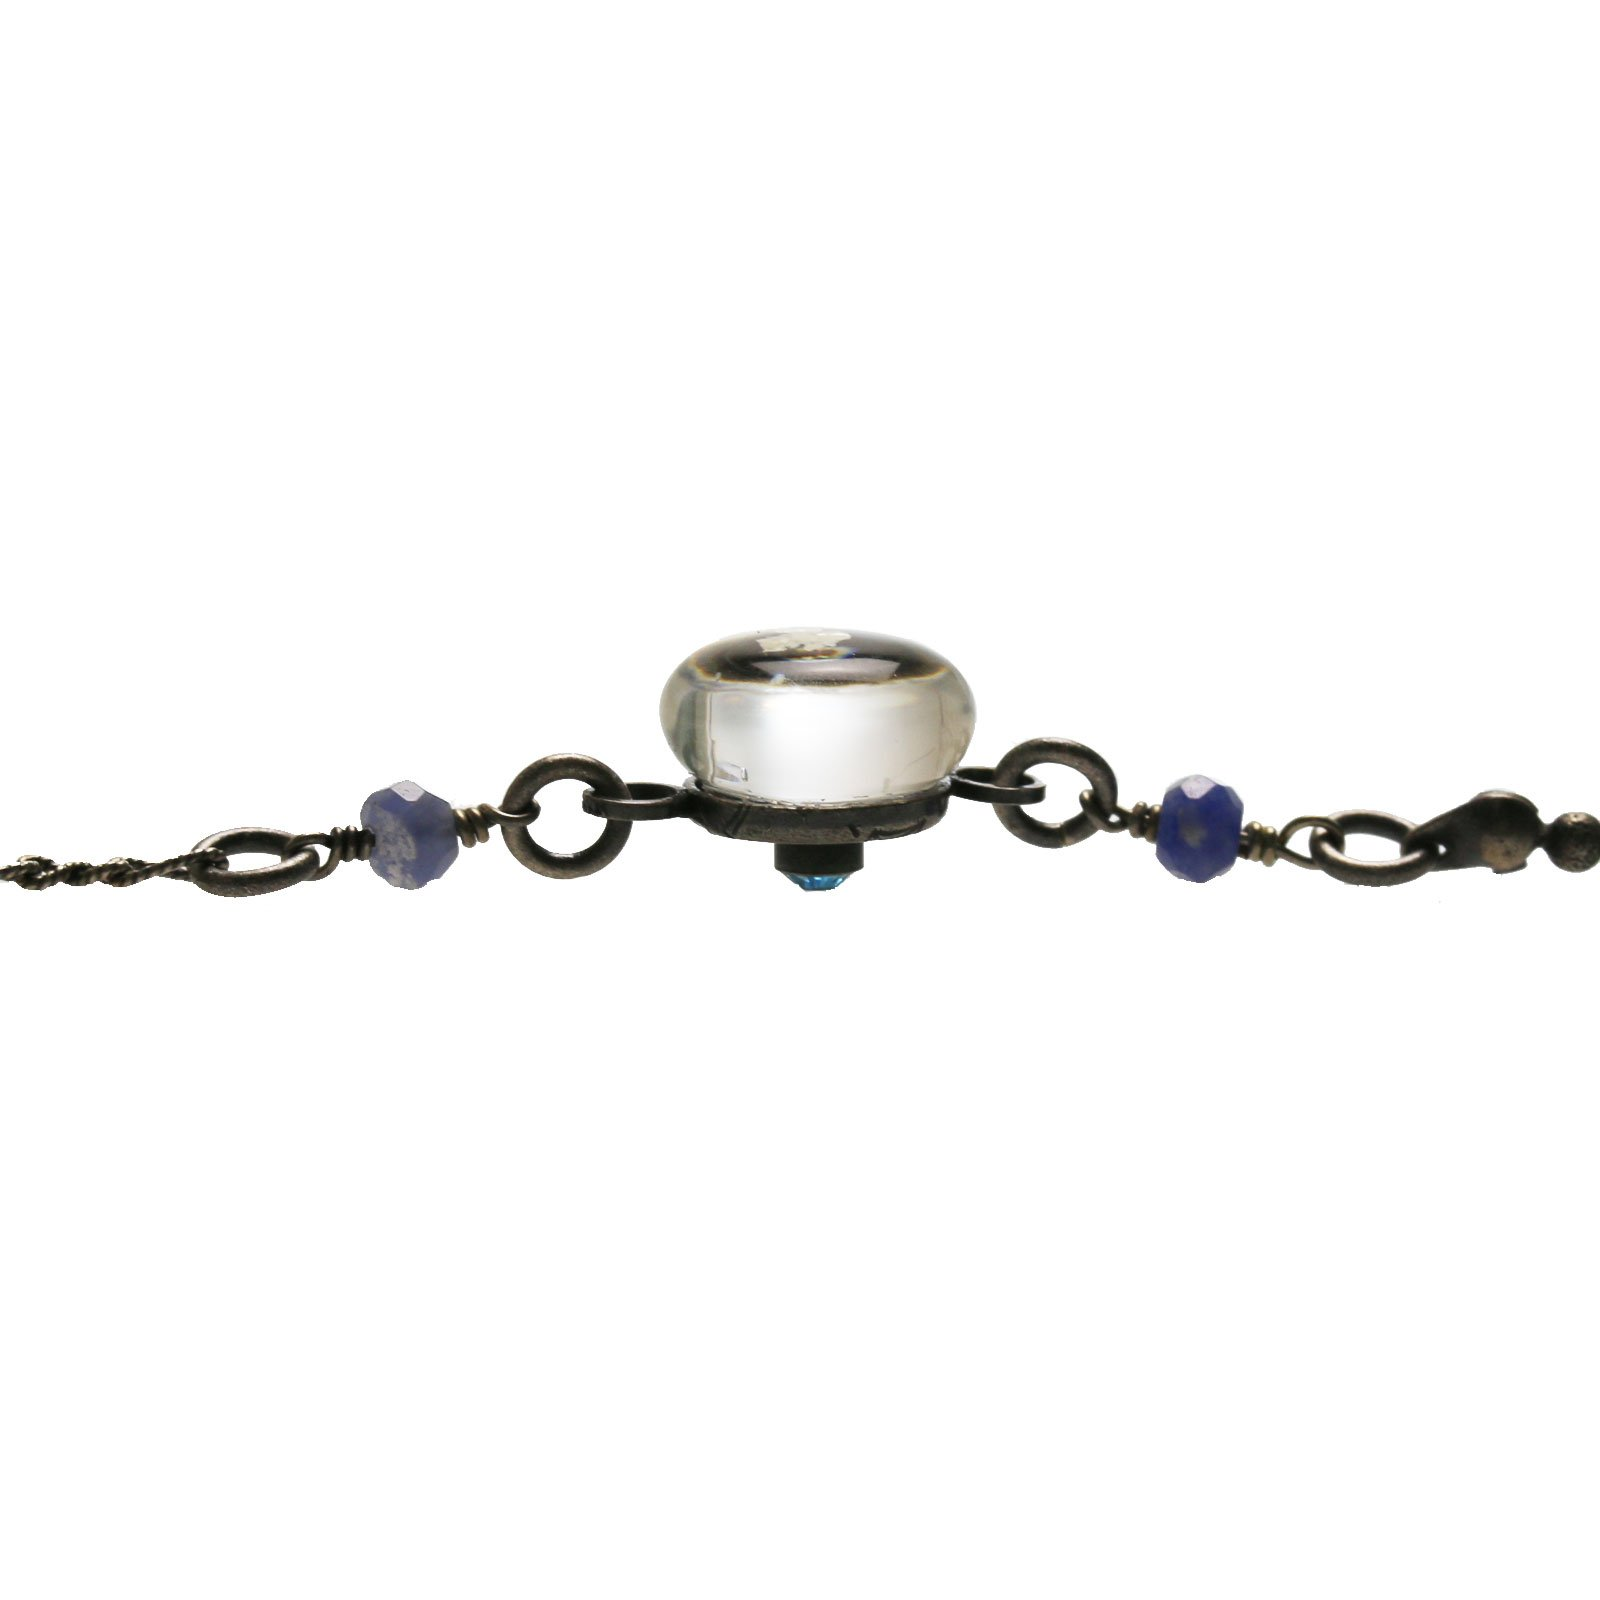 Tamarusan Eyeglasses Chain Eyeglass Chord Musical Note Aquamarine Handmade